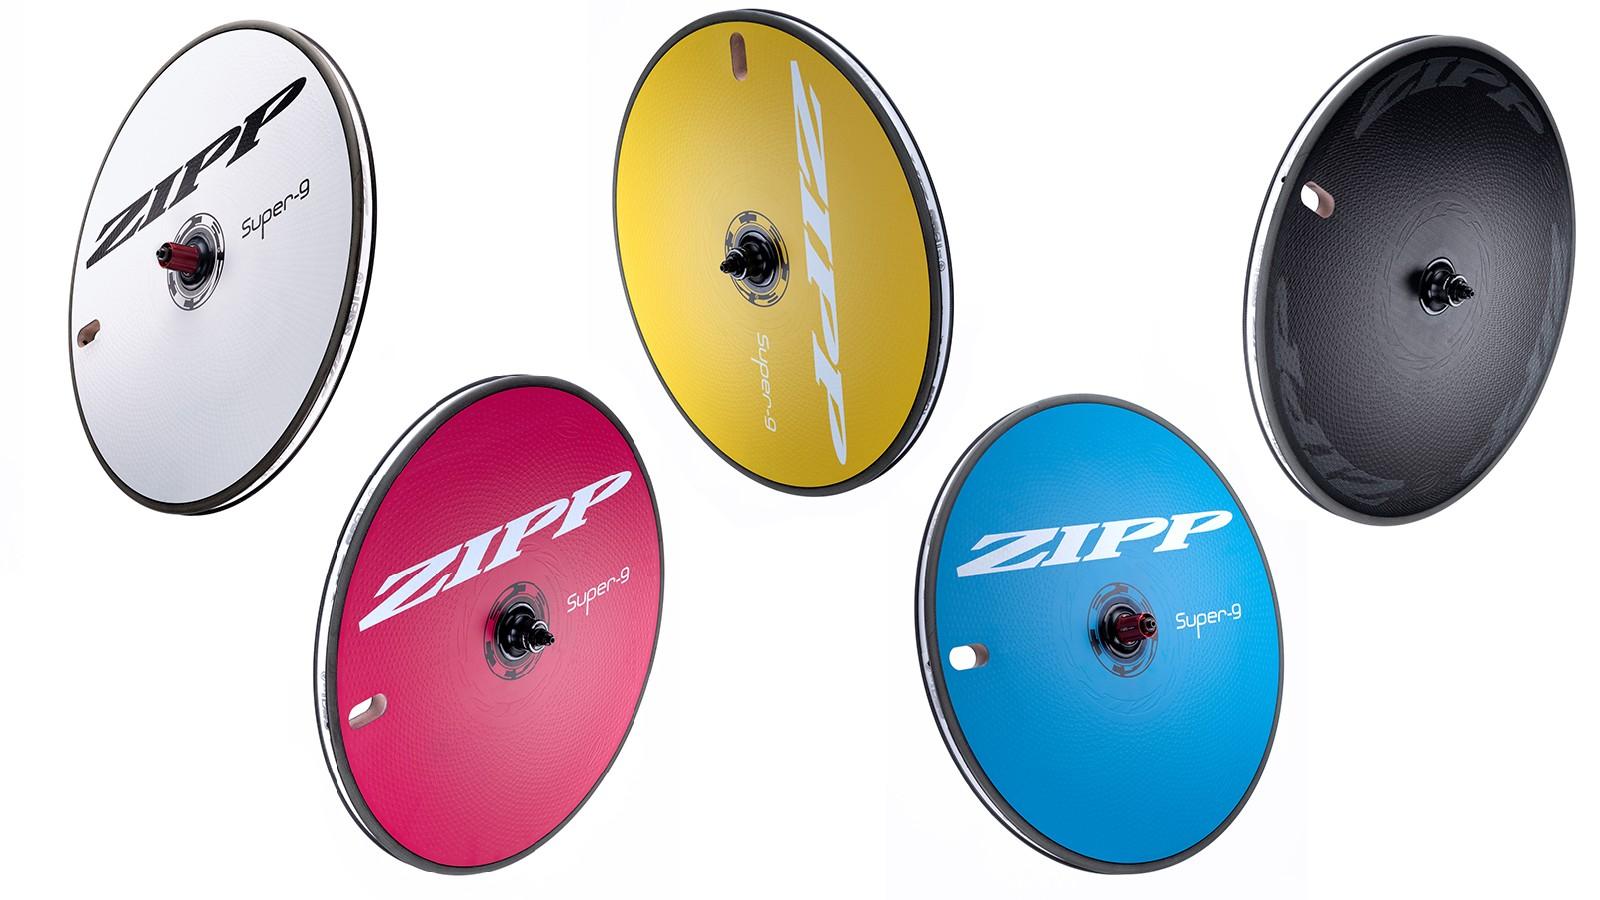 30th Anniversary Edition Zipp Super-9 wheels